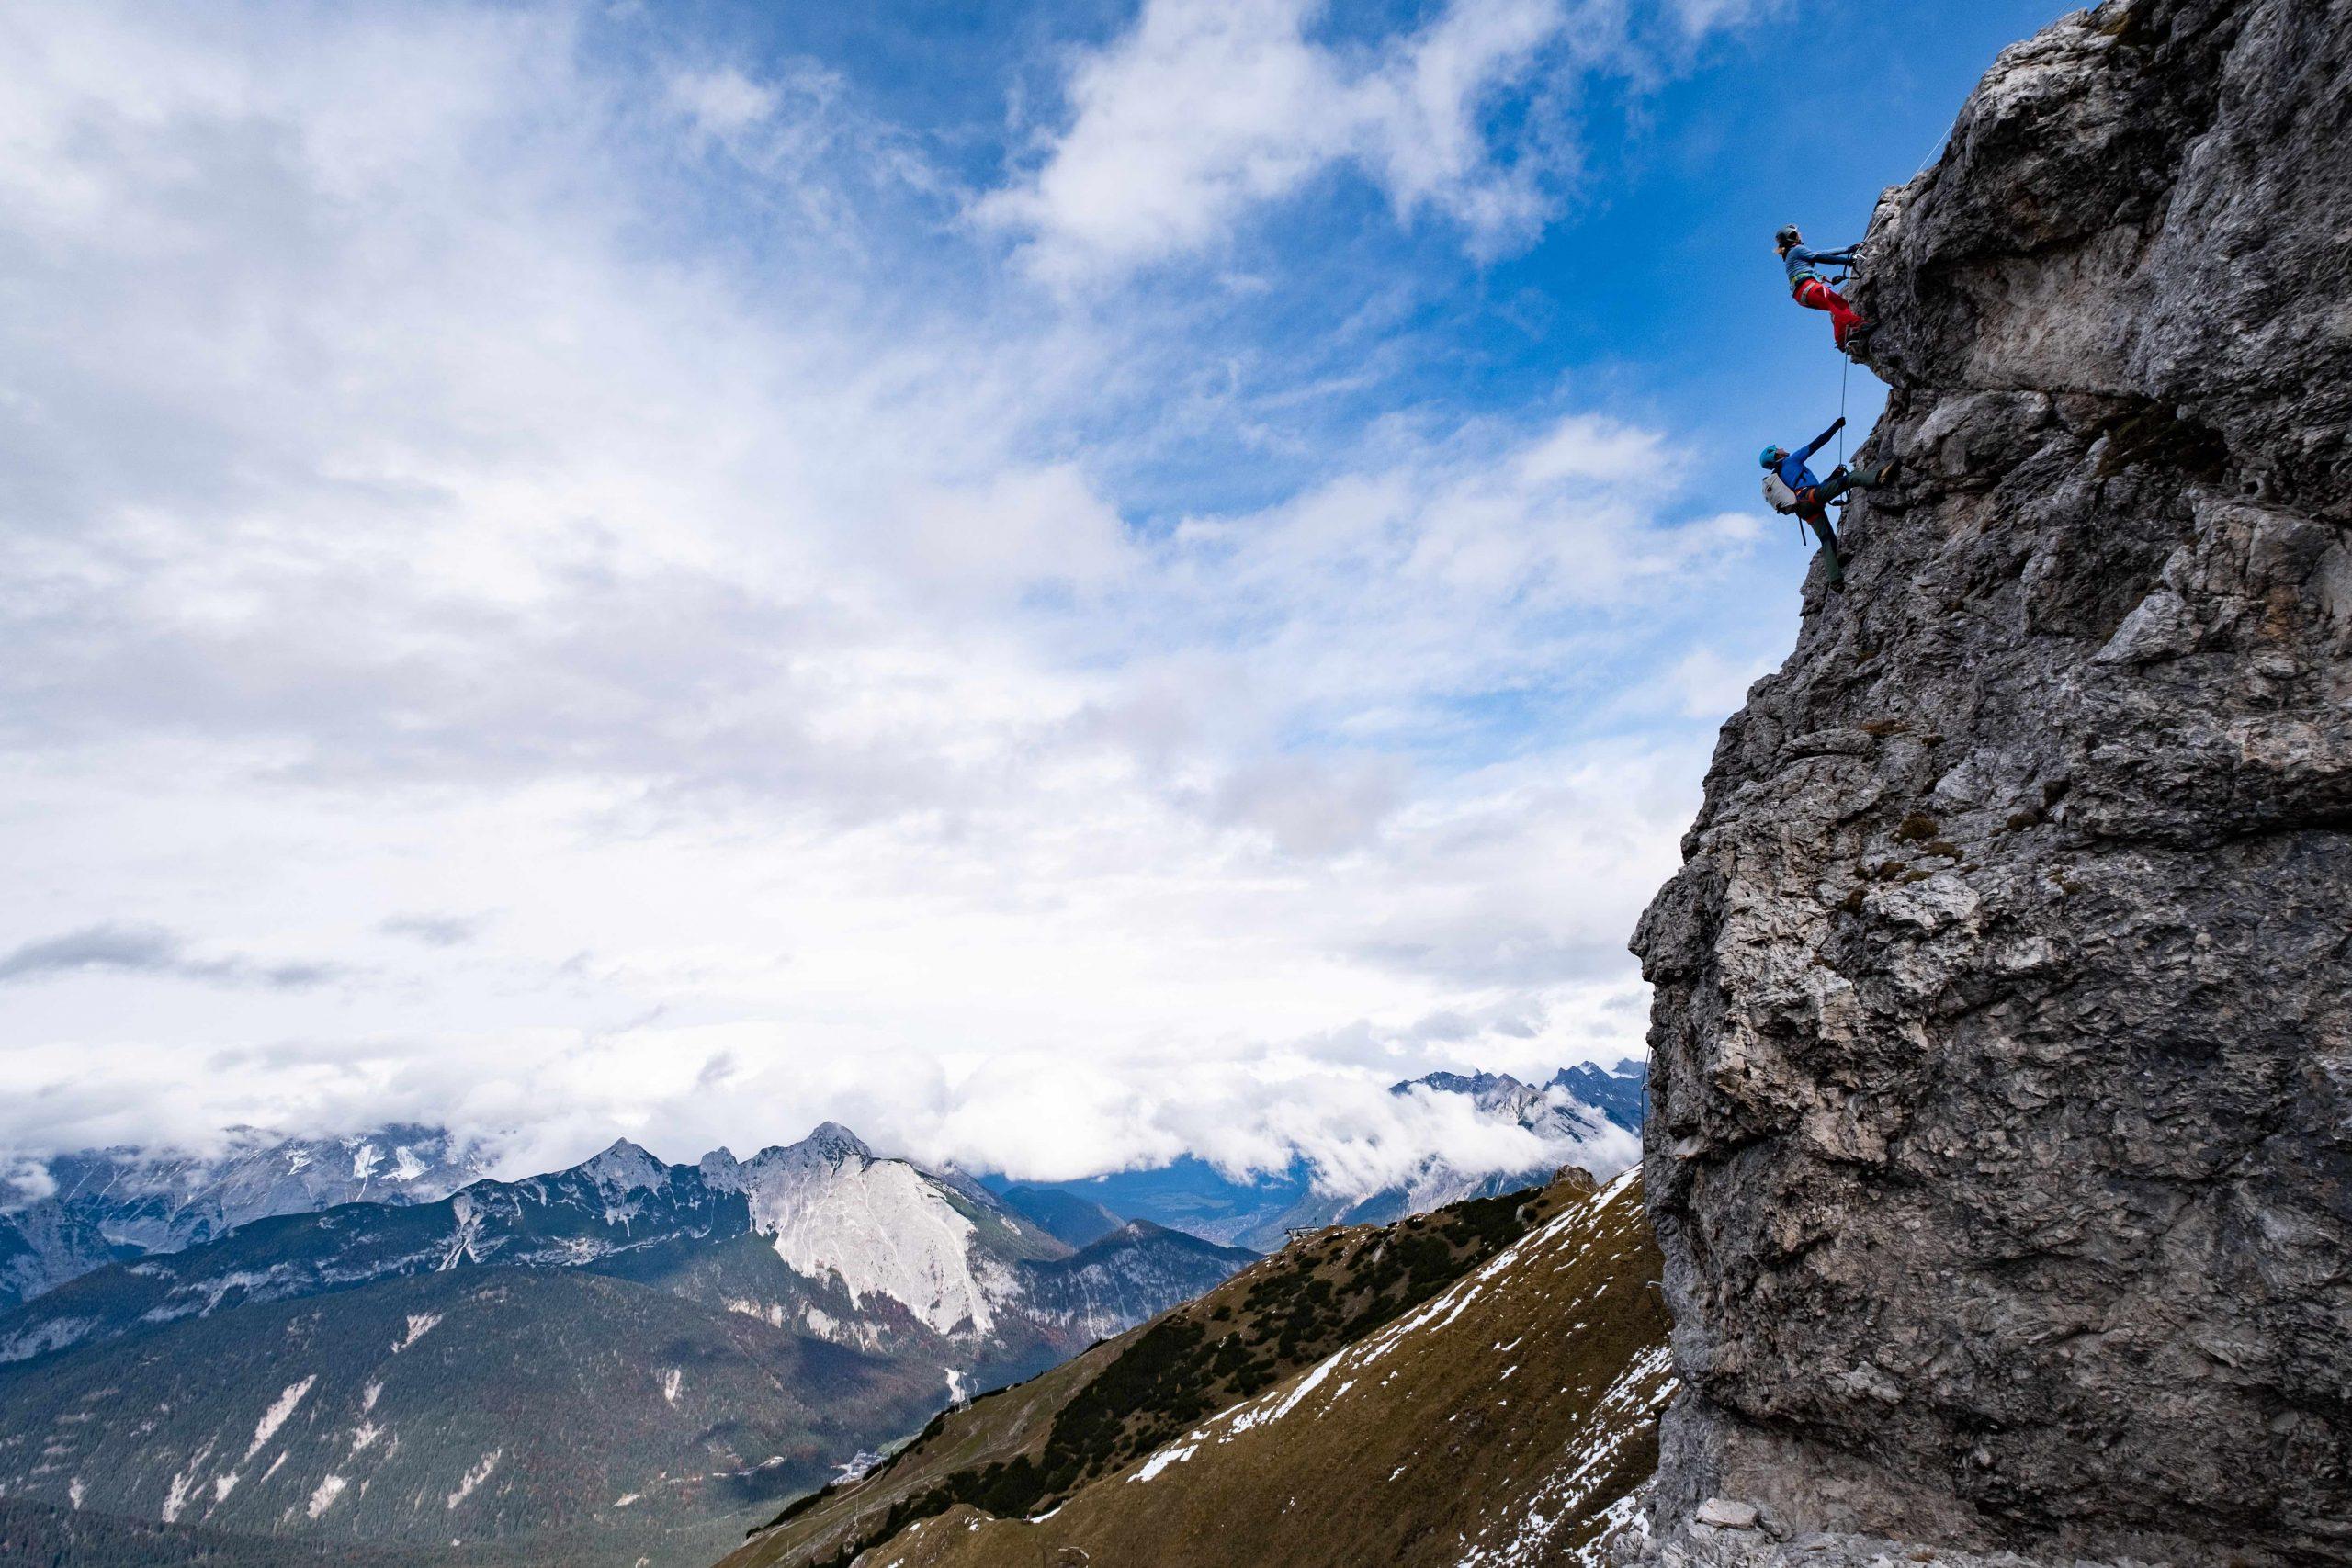 Klettersteig Seefelder Spitze, Foto: Hannes Mair, alpsolut I Climbers Paradise